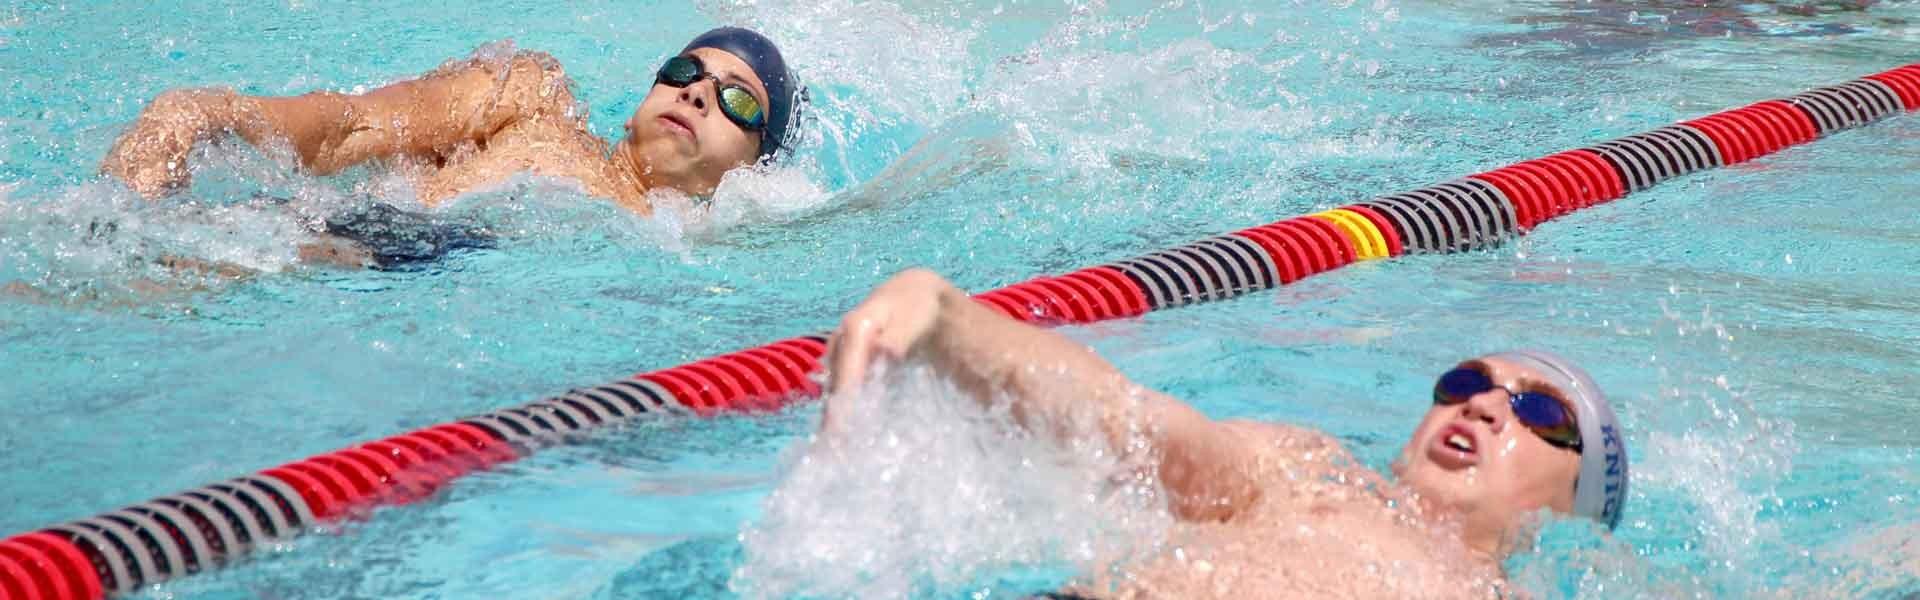 Higley Unified School District Arizona USA Swimming 2019